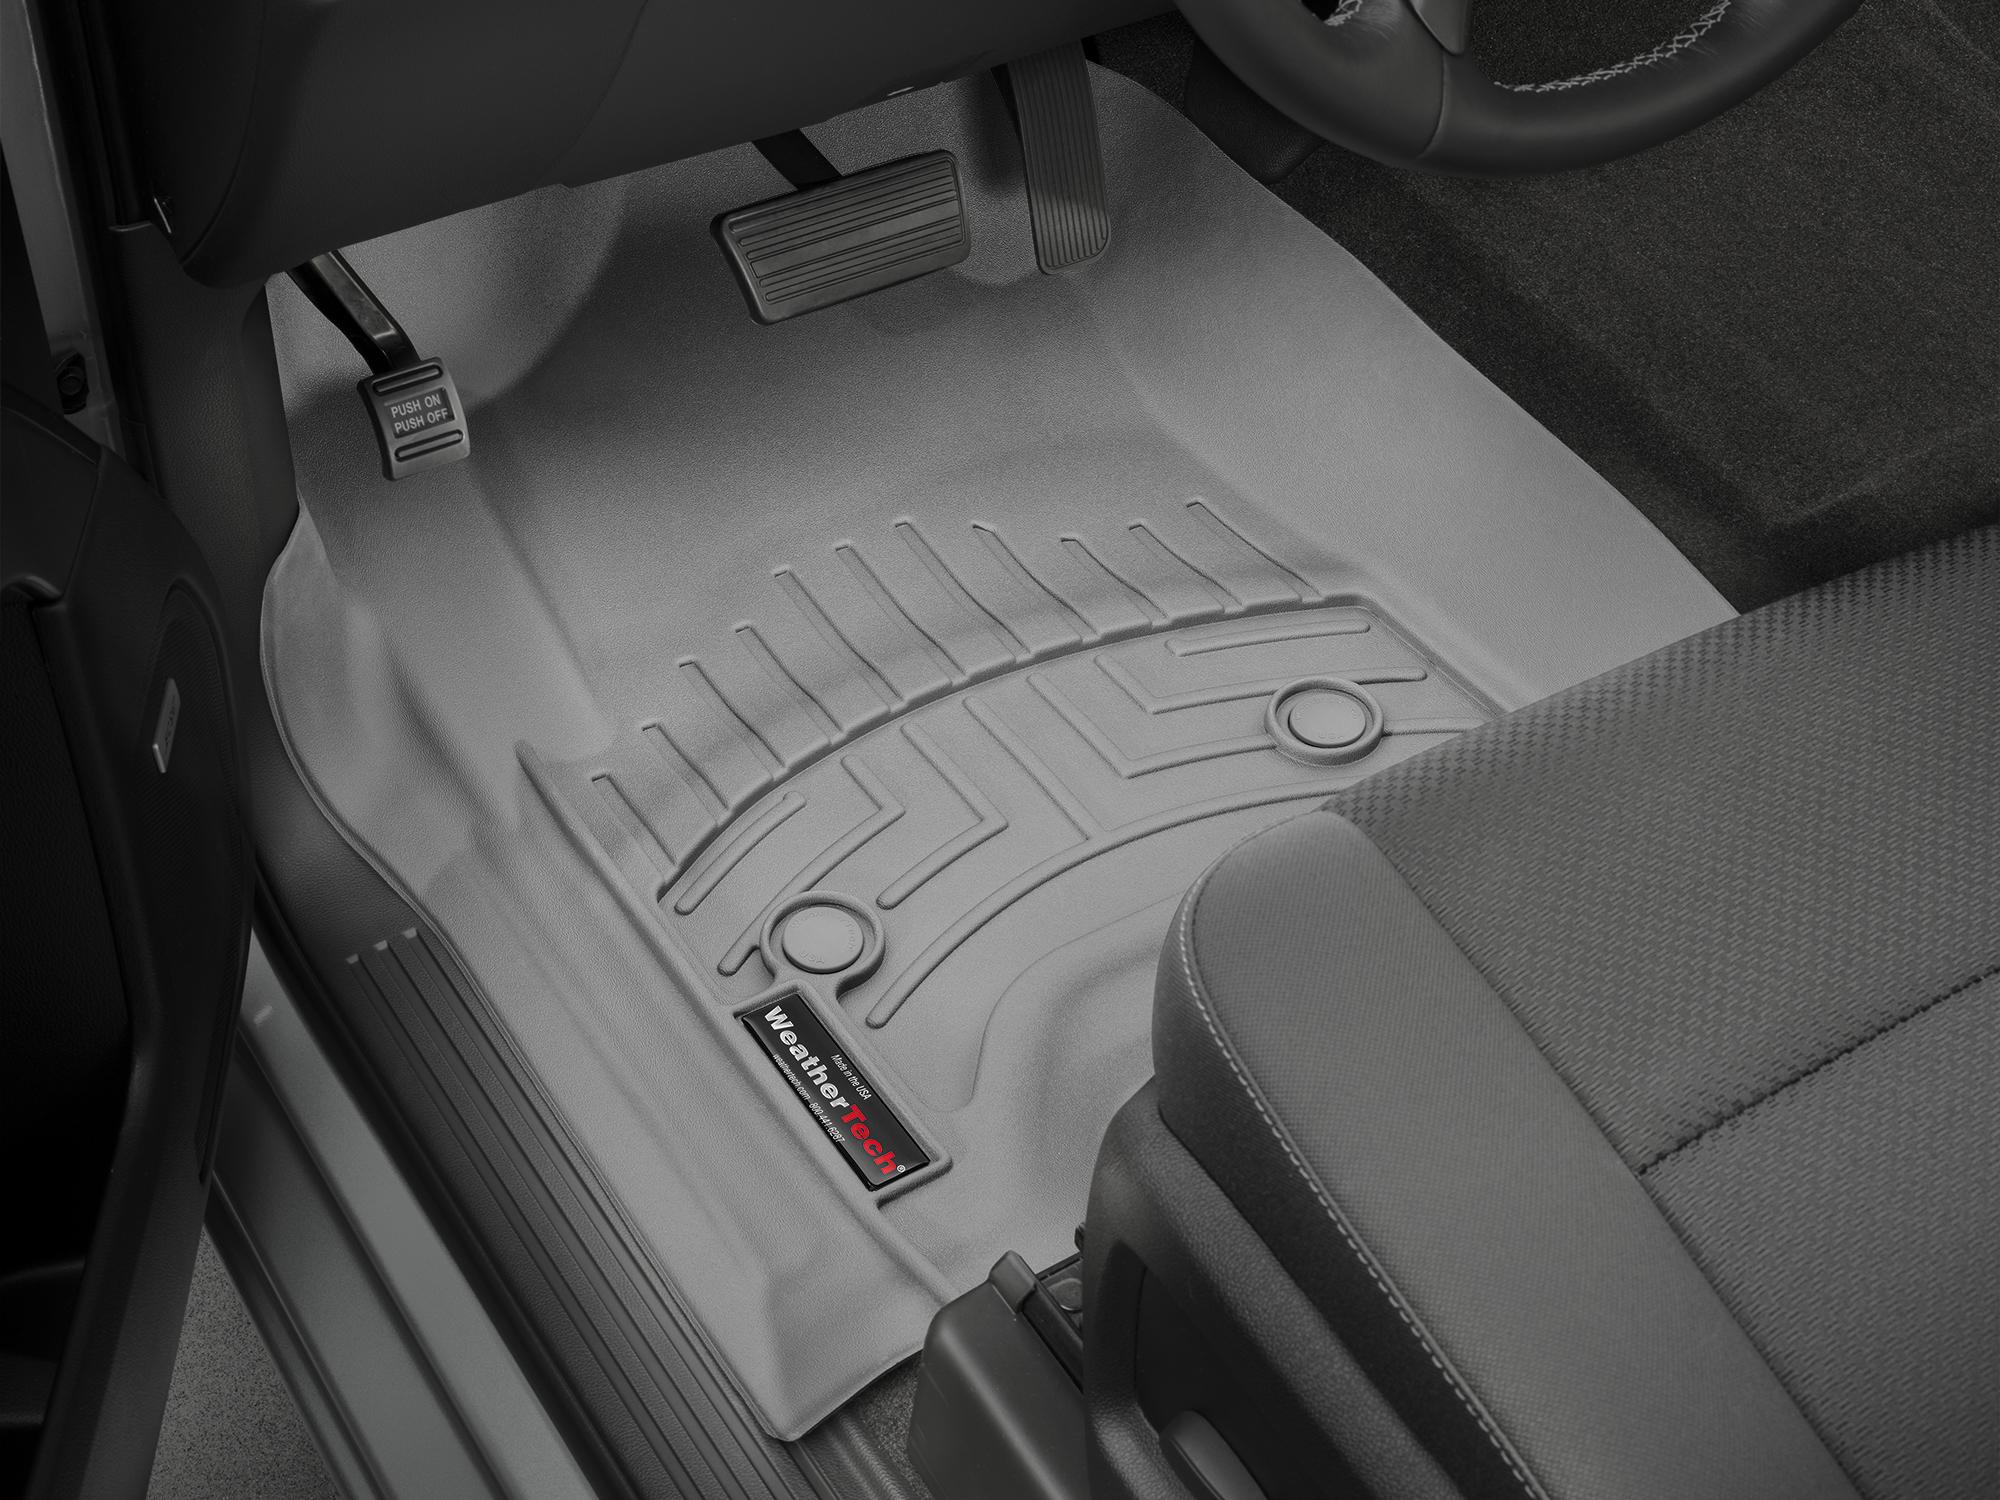 Trc Tuning Corporations Germany E K Toyota Lexus Mazda Tesla Tuning Developments Trc Performance Weathertech Fussmatten Chevrolet Silverado 2500hd 3500hd Grau